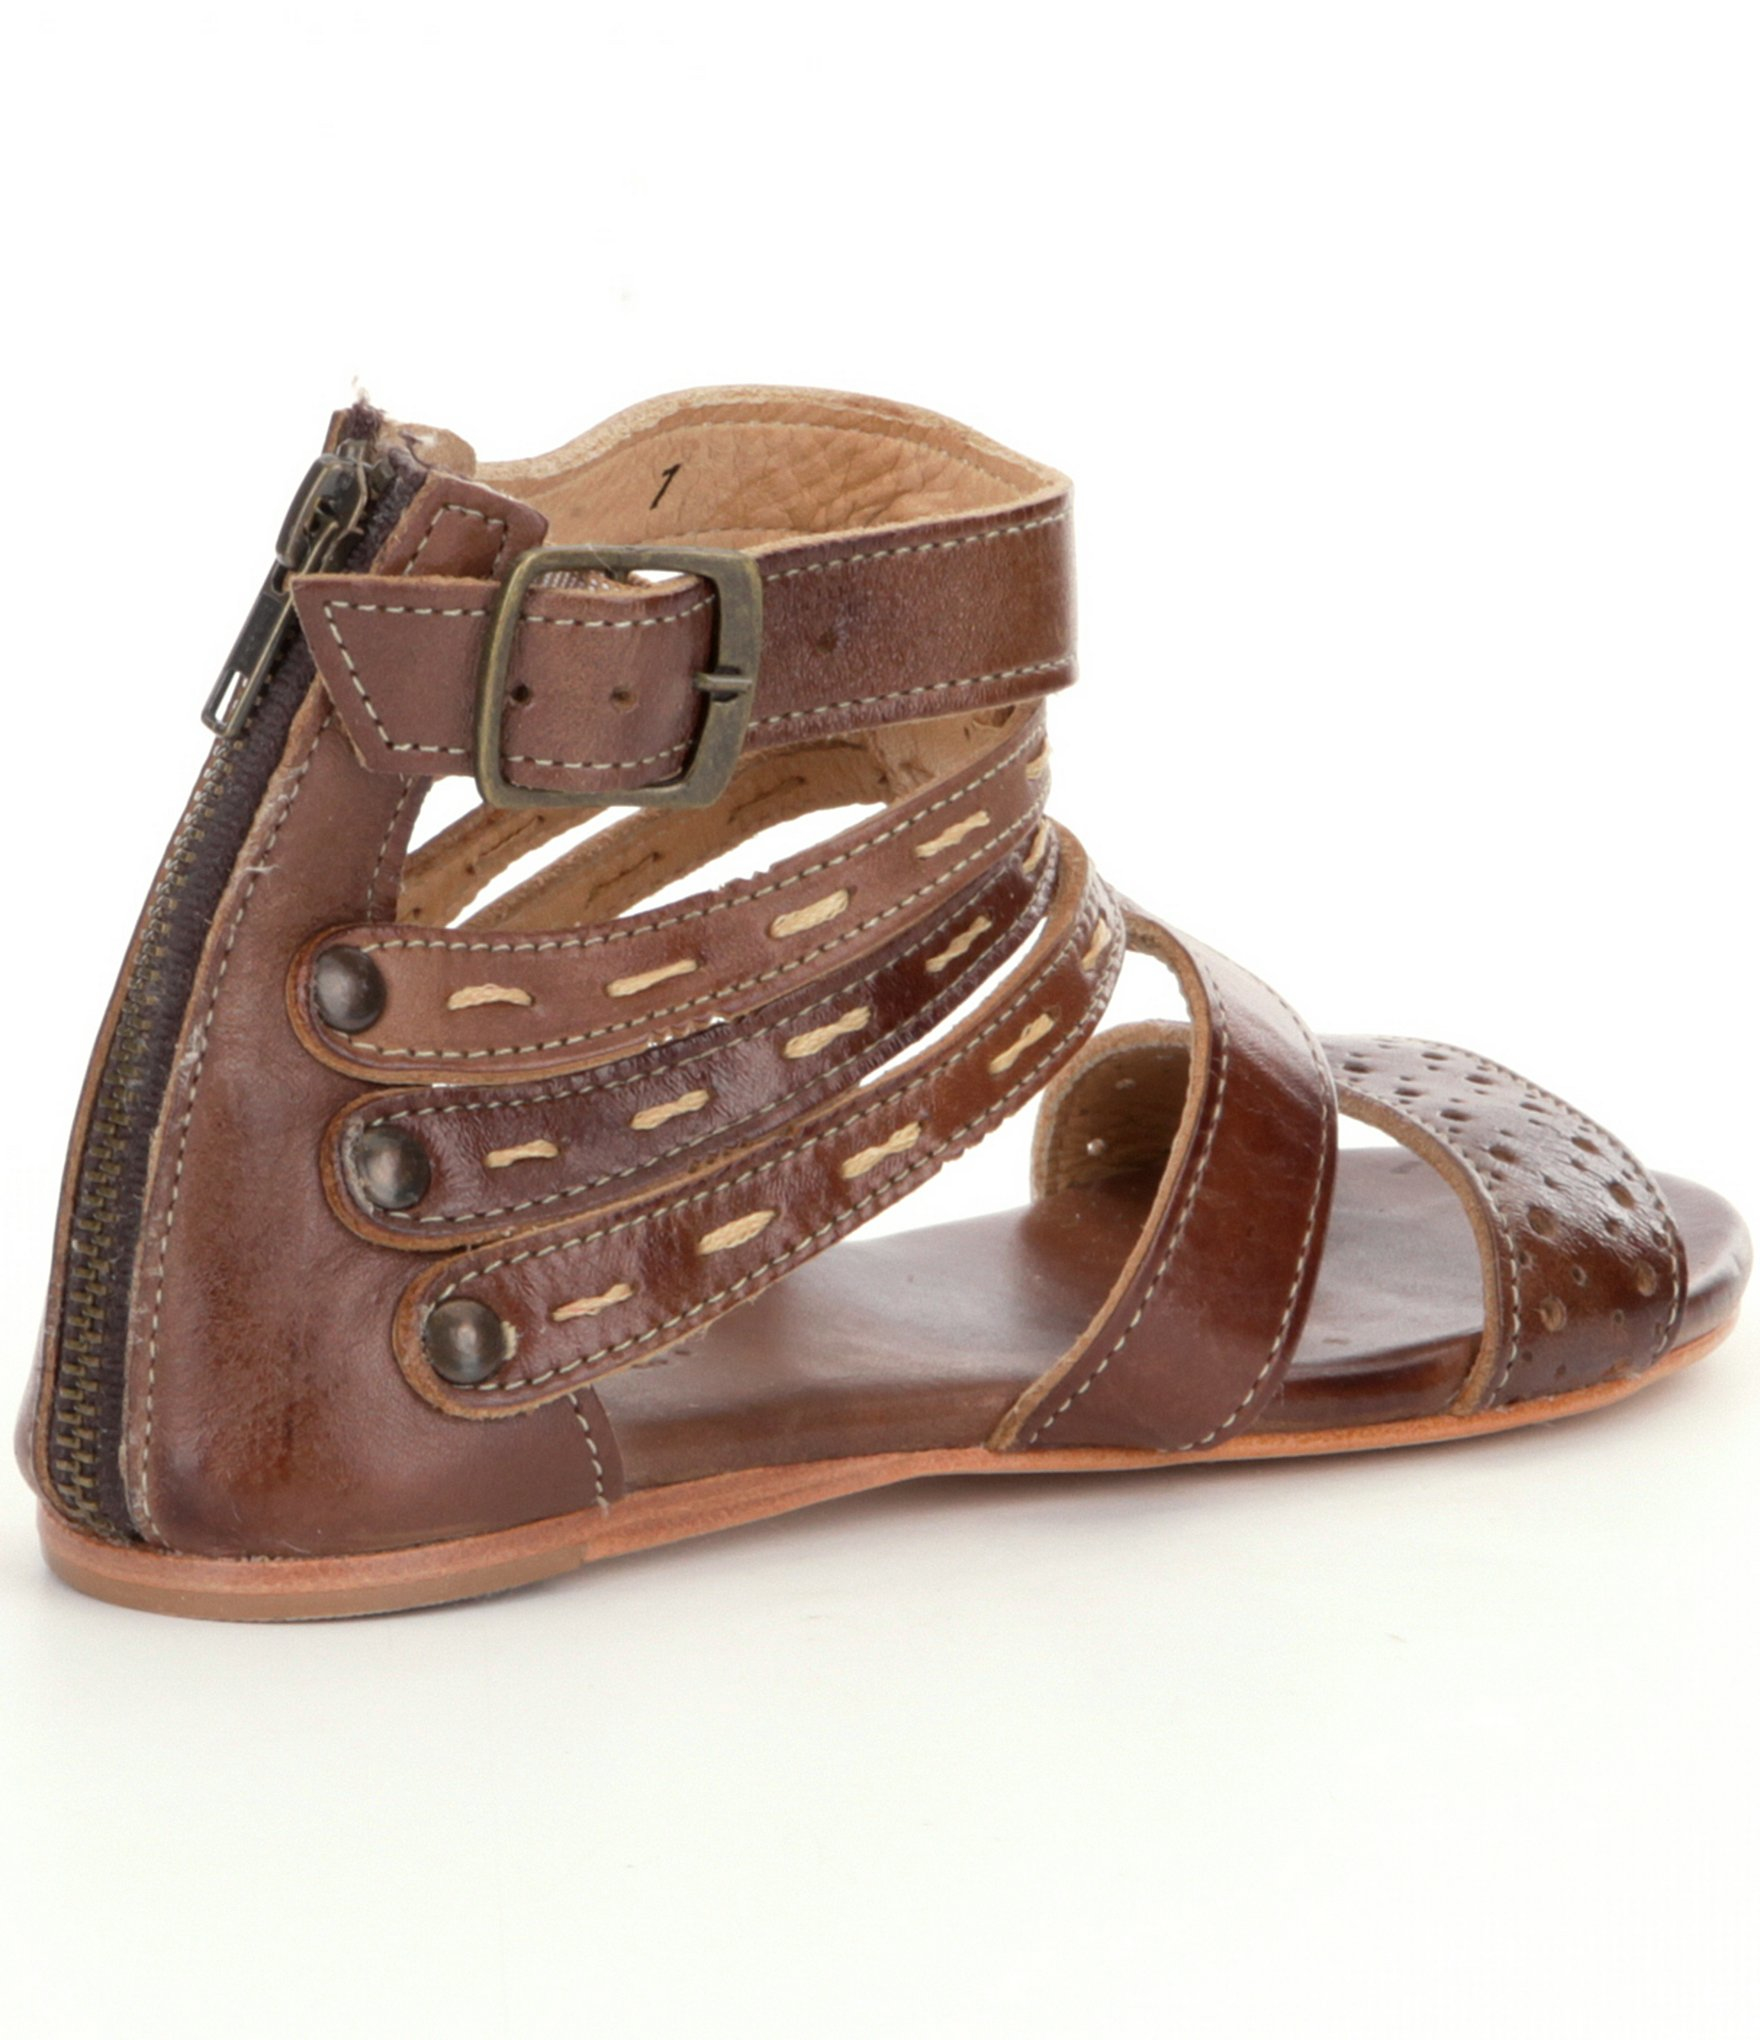 Lyst - Bed Stu Artemis Multi-Strap Sandals In Brown-8025